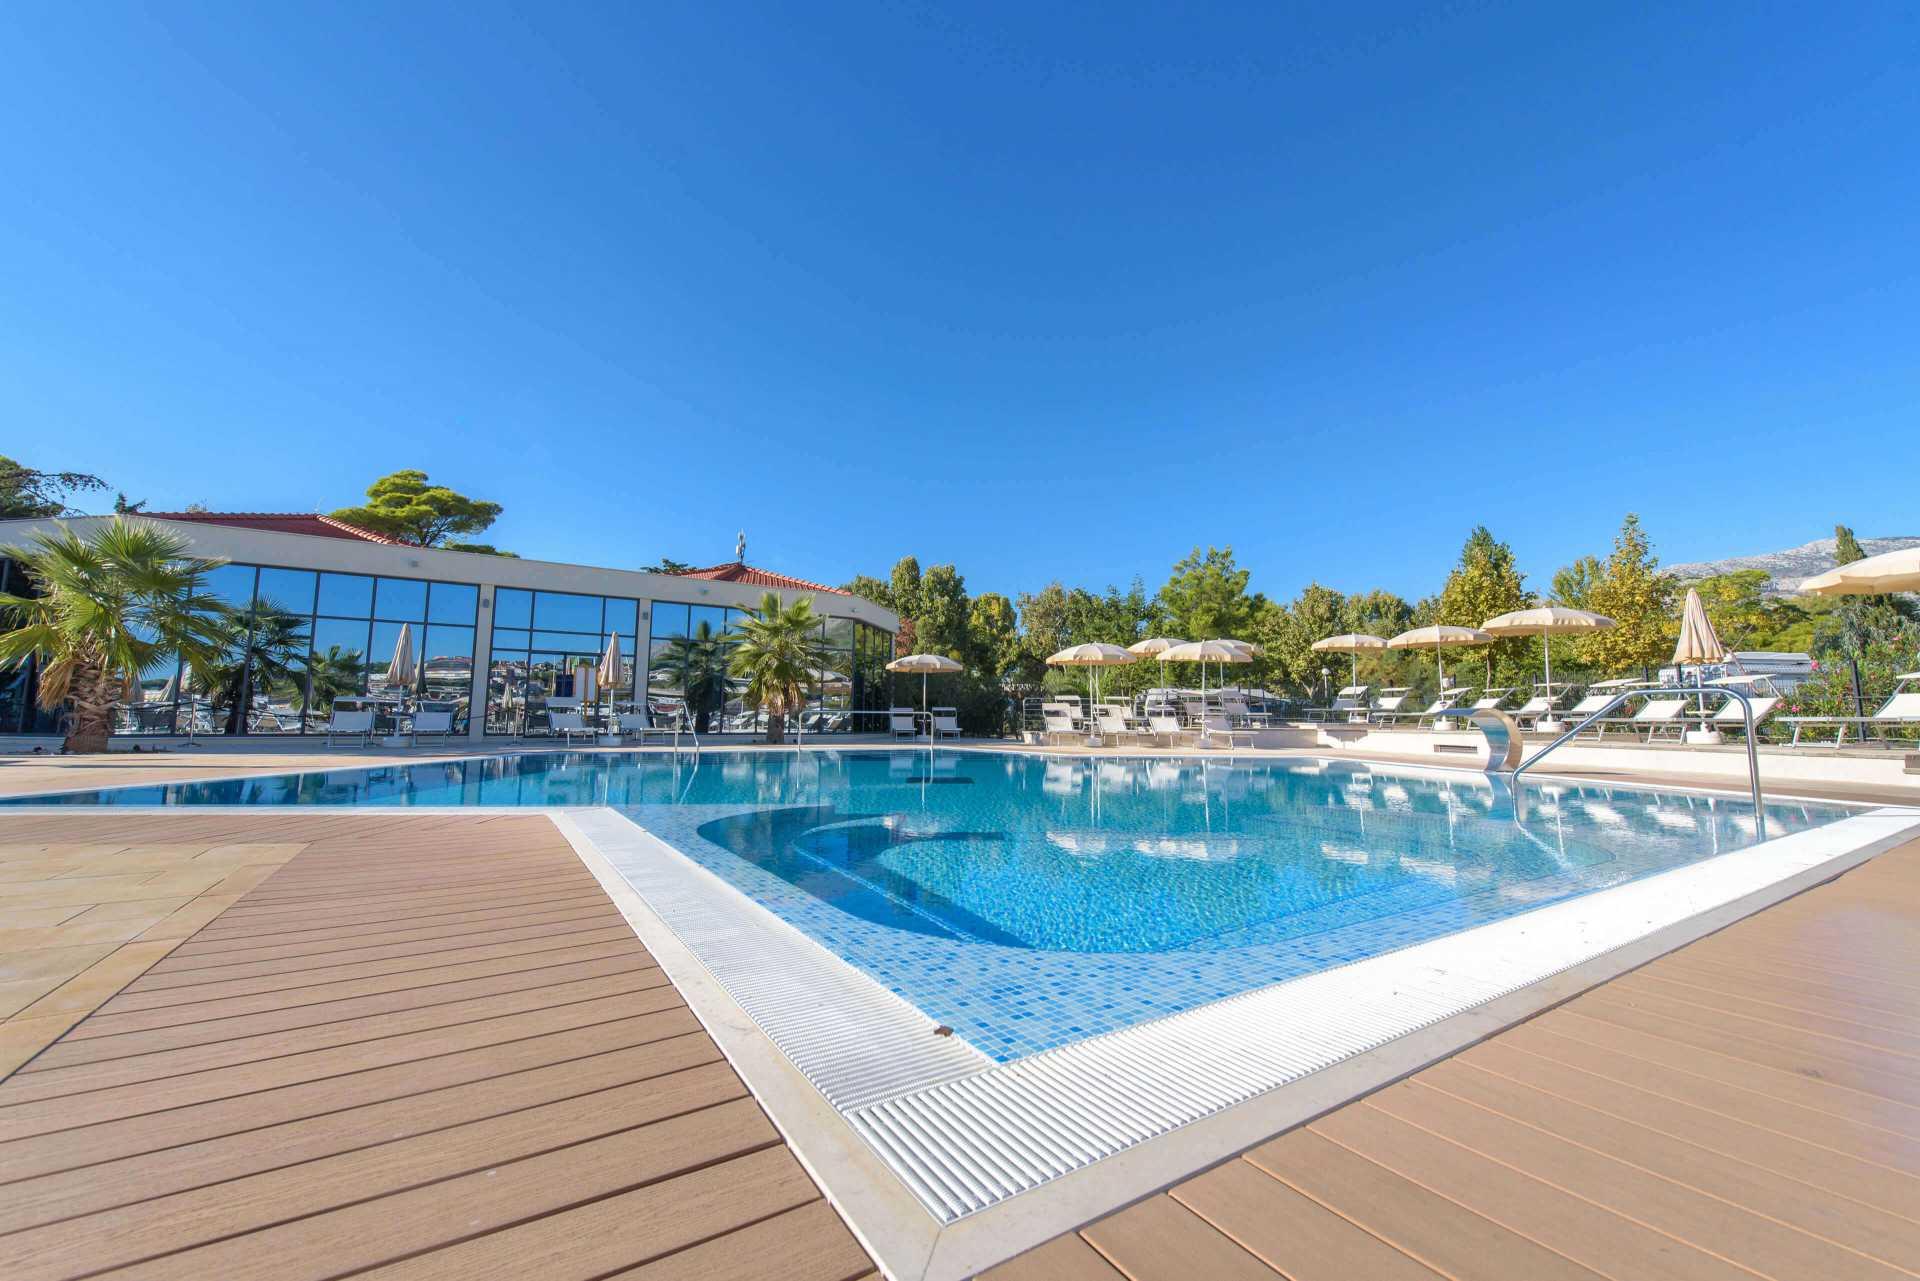 Wellness & Spa & Pools in Camping Split